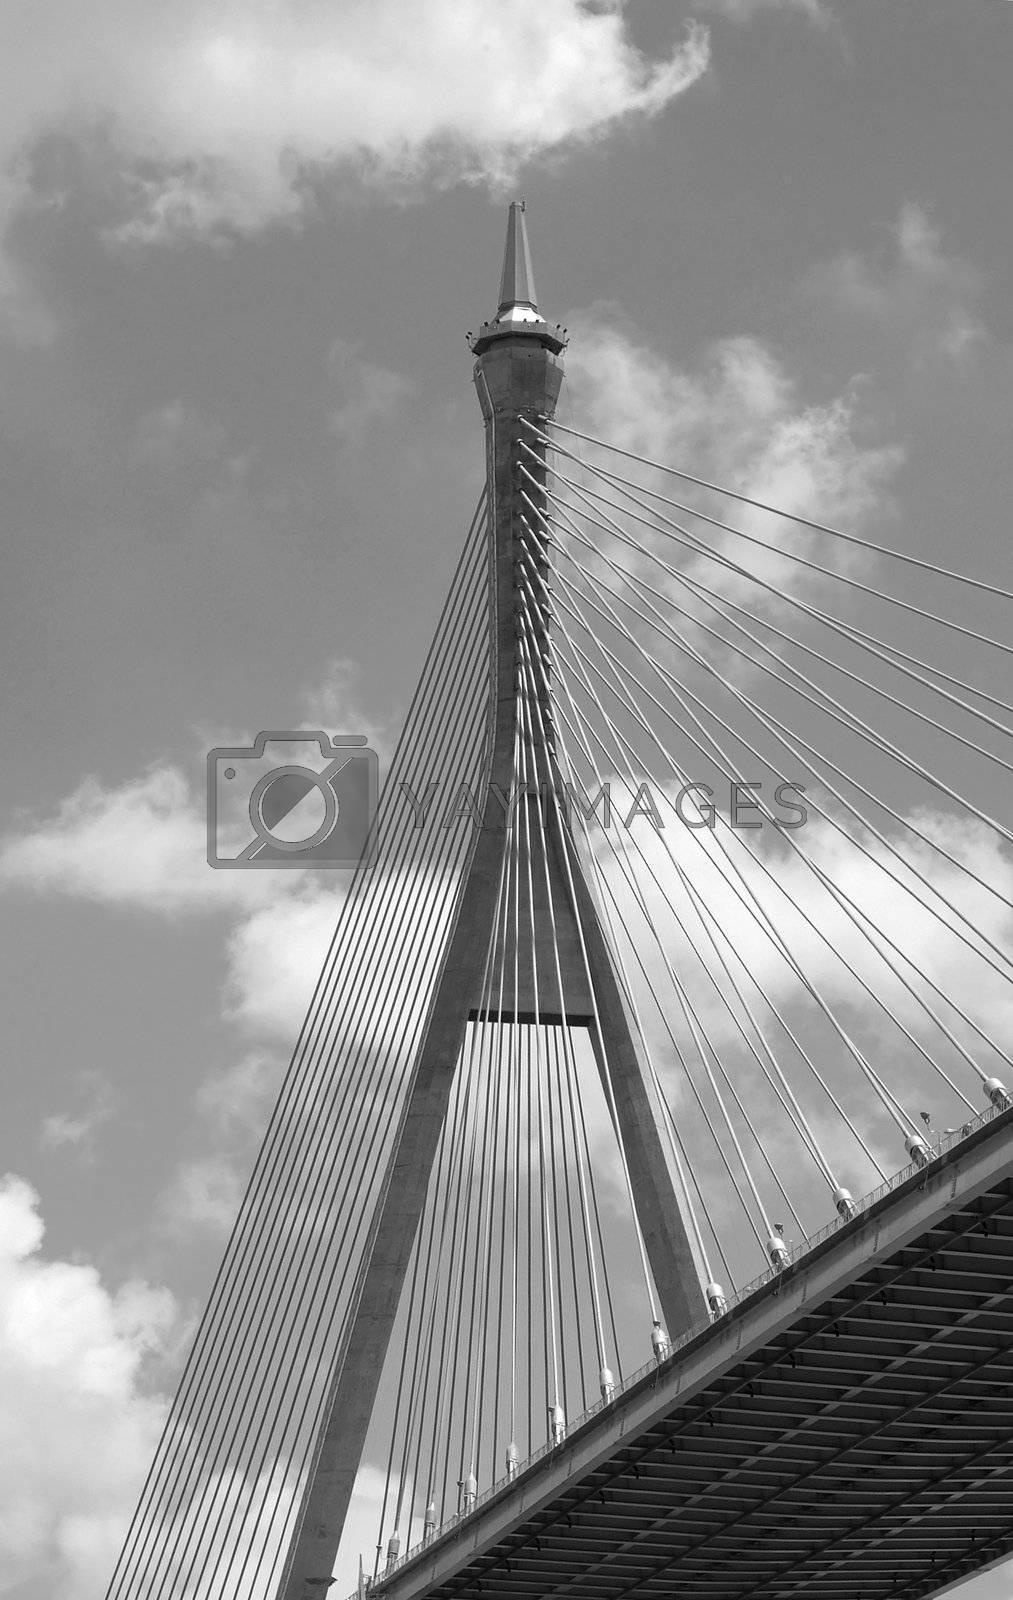 Royalty free image of Suspension bridge in Bangkok by epixx